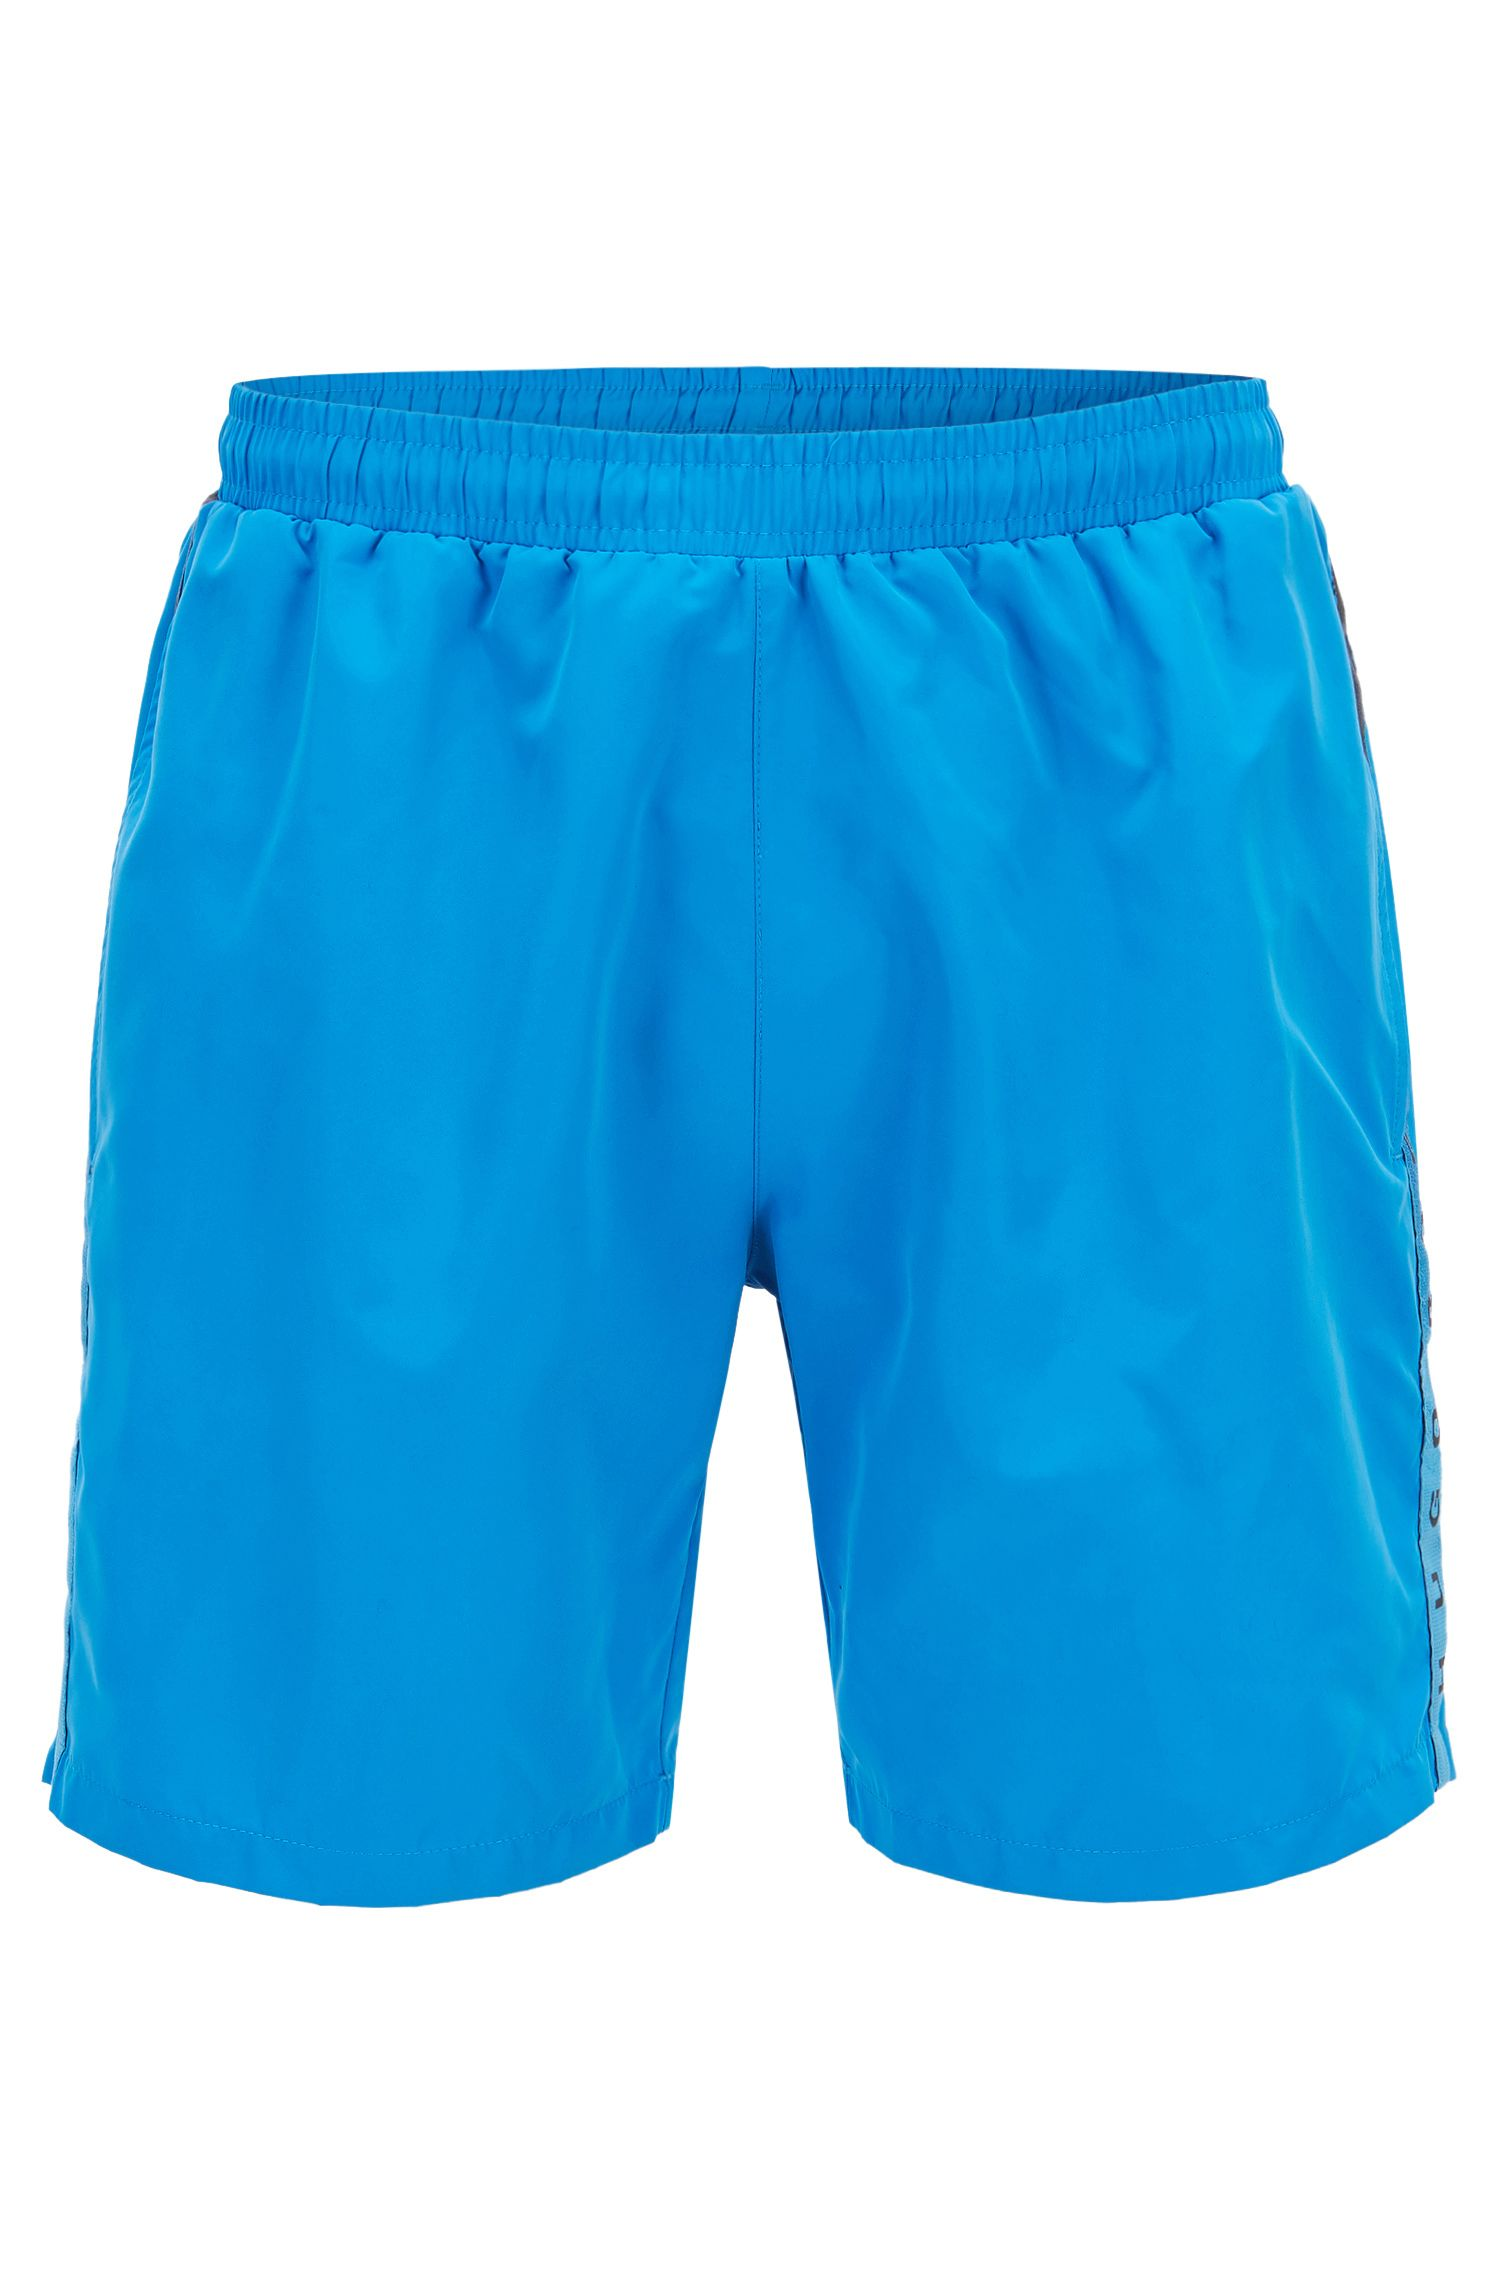 Swim shorts in quick-drying technical fabric